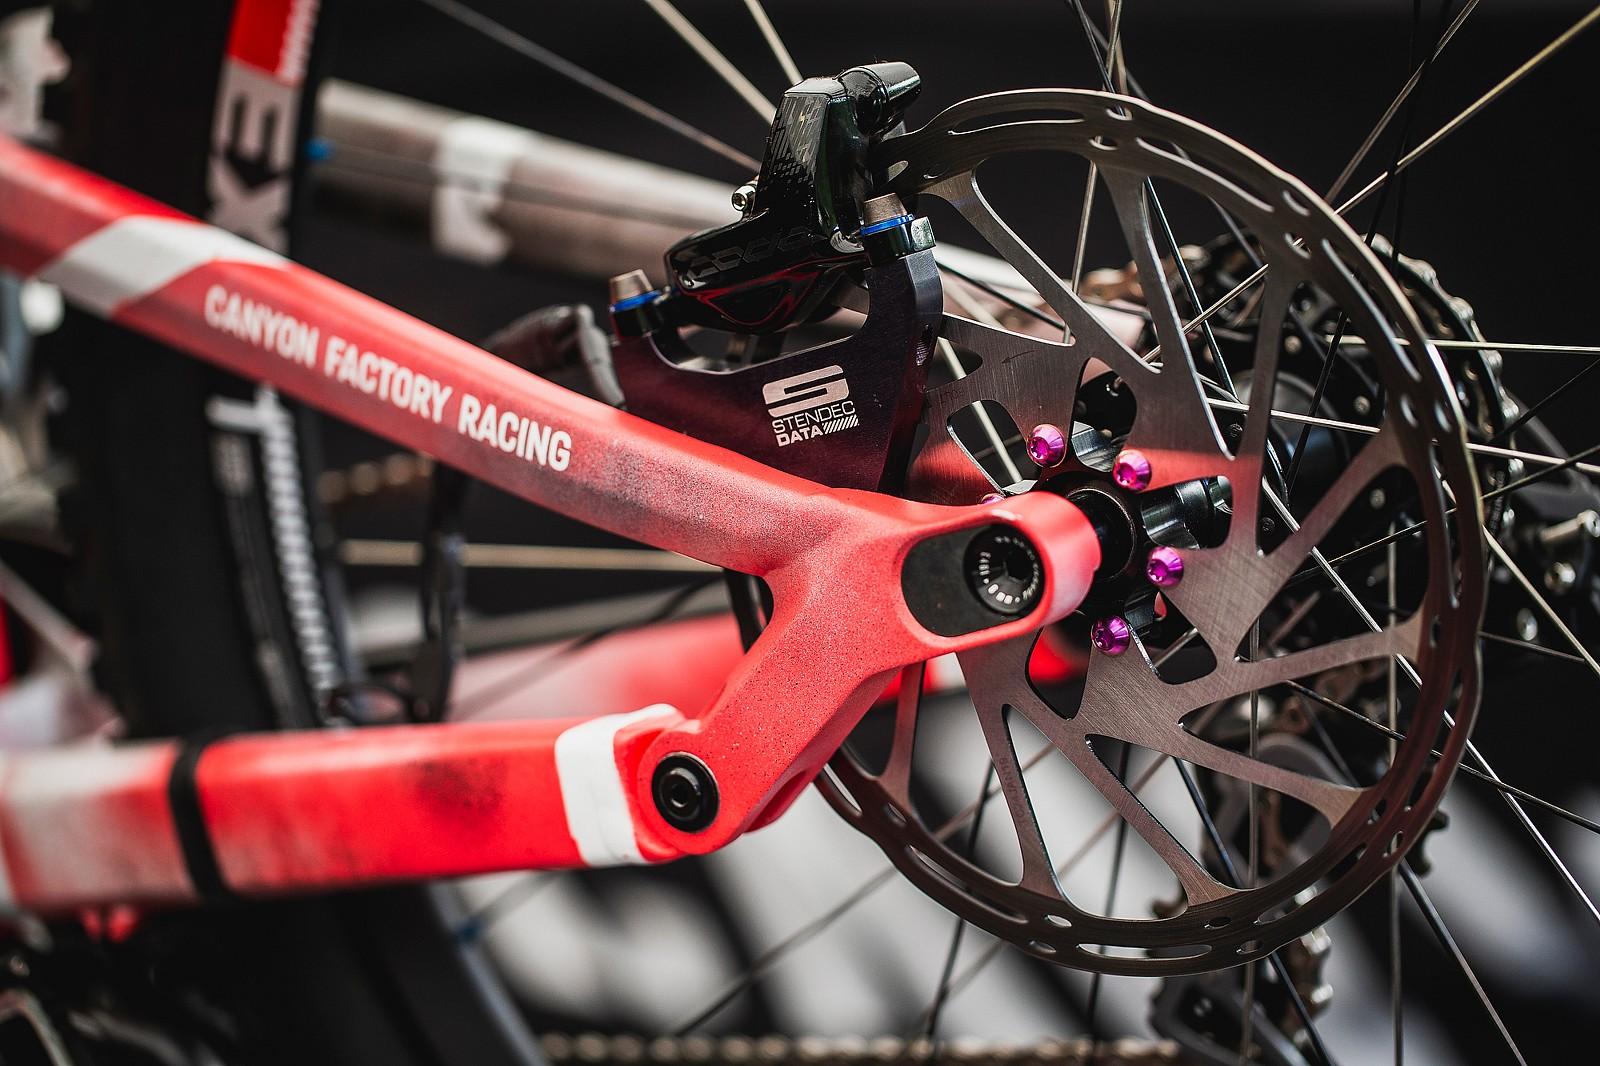 Stendec Data Goods - PIT BITS - 2019 Val di Sole World Cup Downhill Bike Tech - Mountain Biking Pictures - Vital MTB